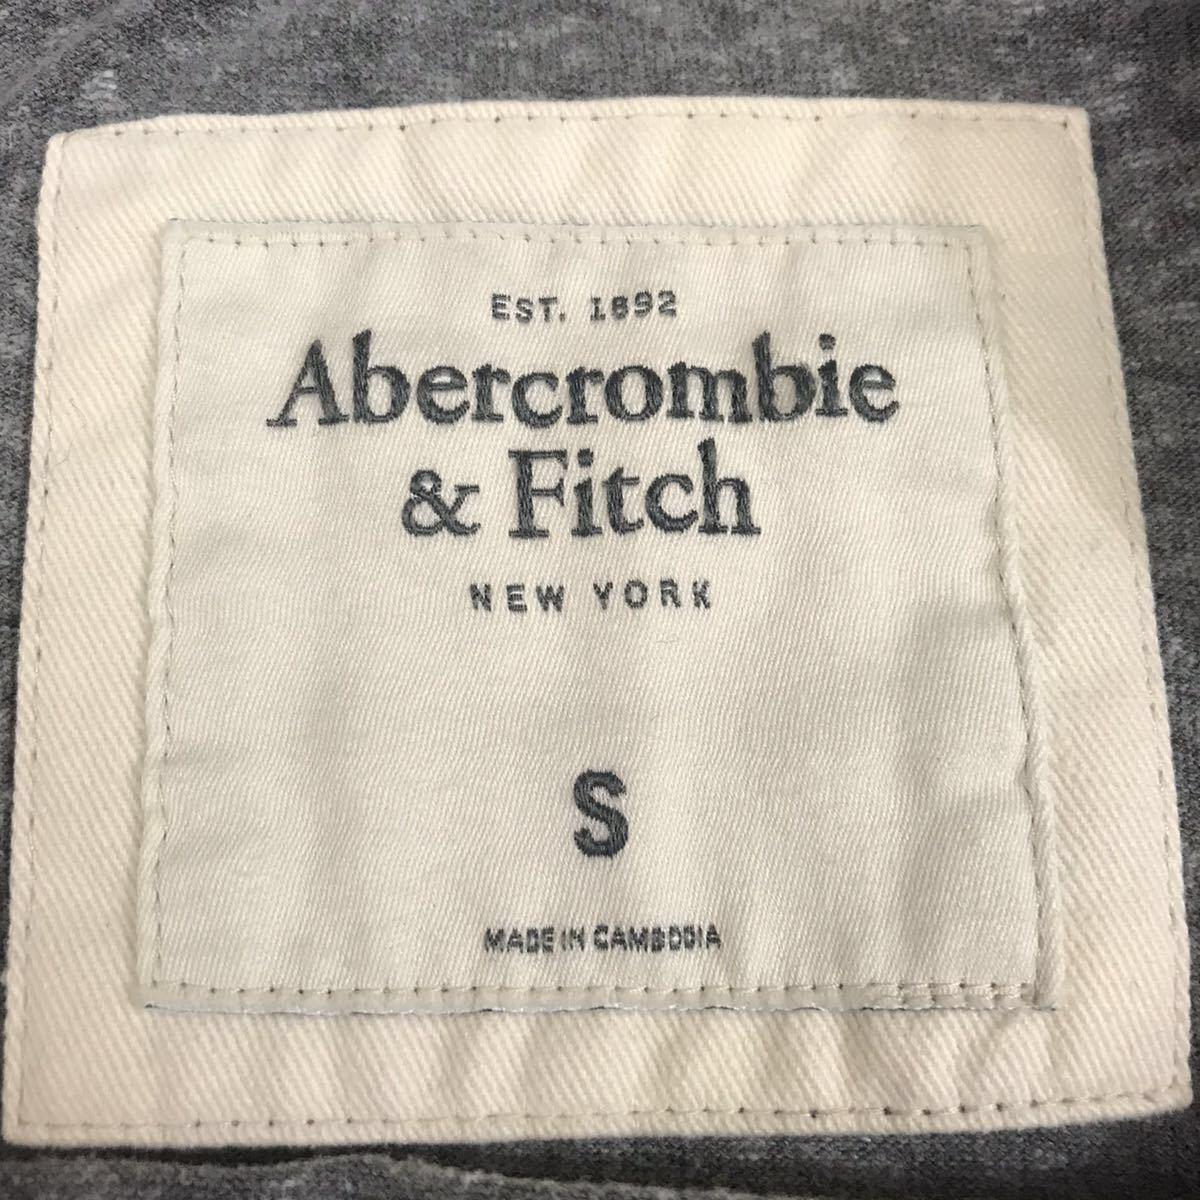 Abercrombie&Fitch アバクロンビー&フィッチ Tシャツ 半袖シャツ 霜降り ロゴ刺繍 丸首 グレー ブルー メンズ Sサイズ ♭□ ∞